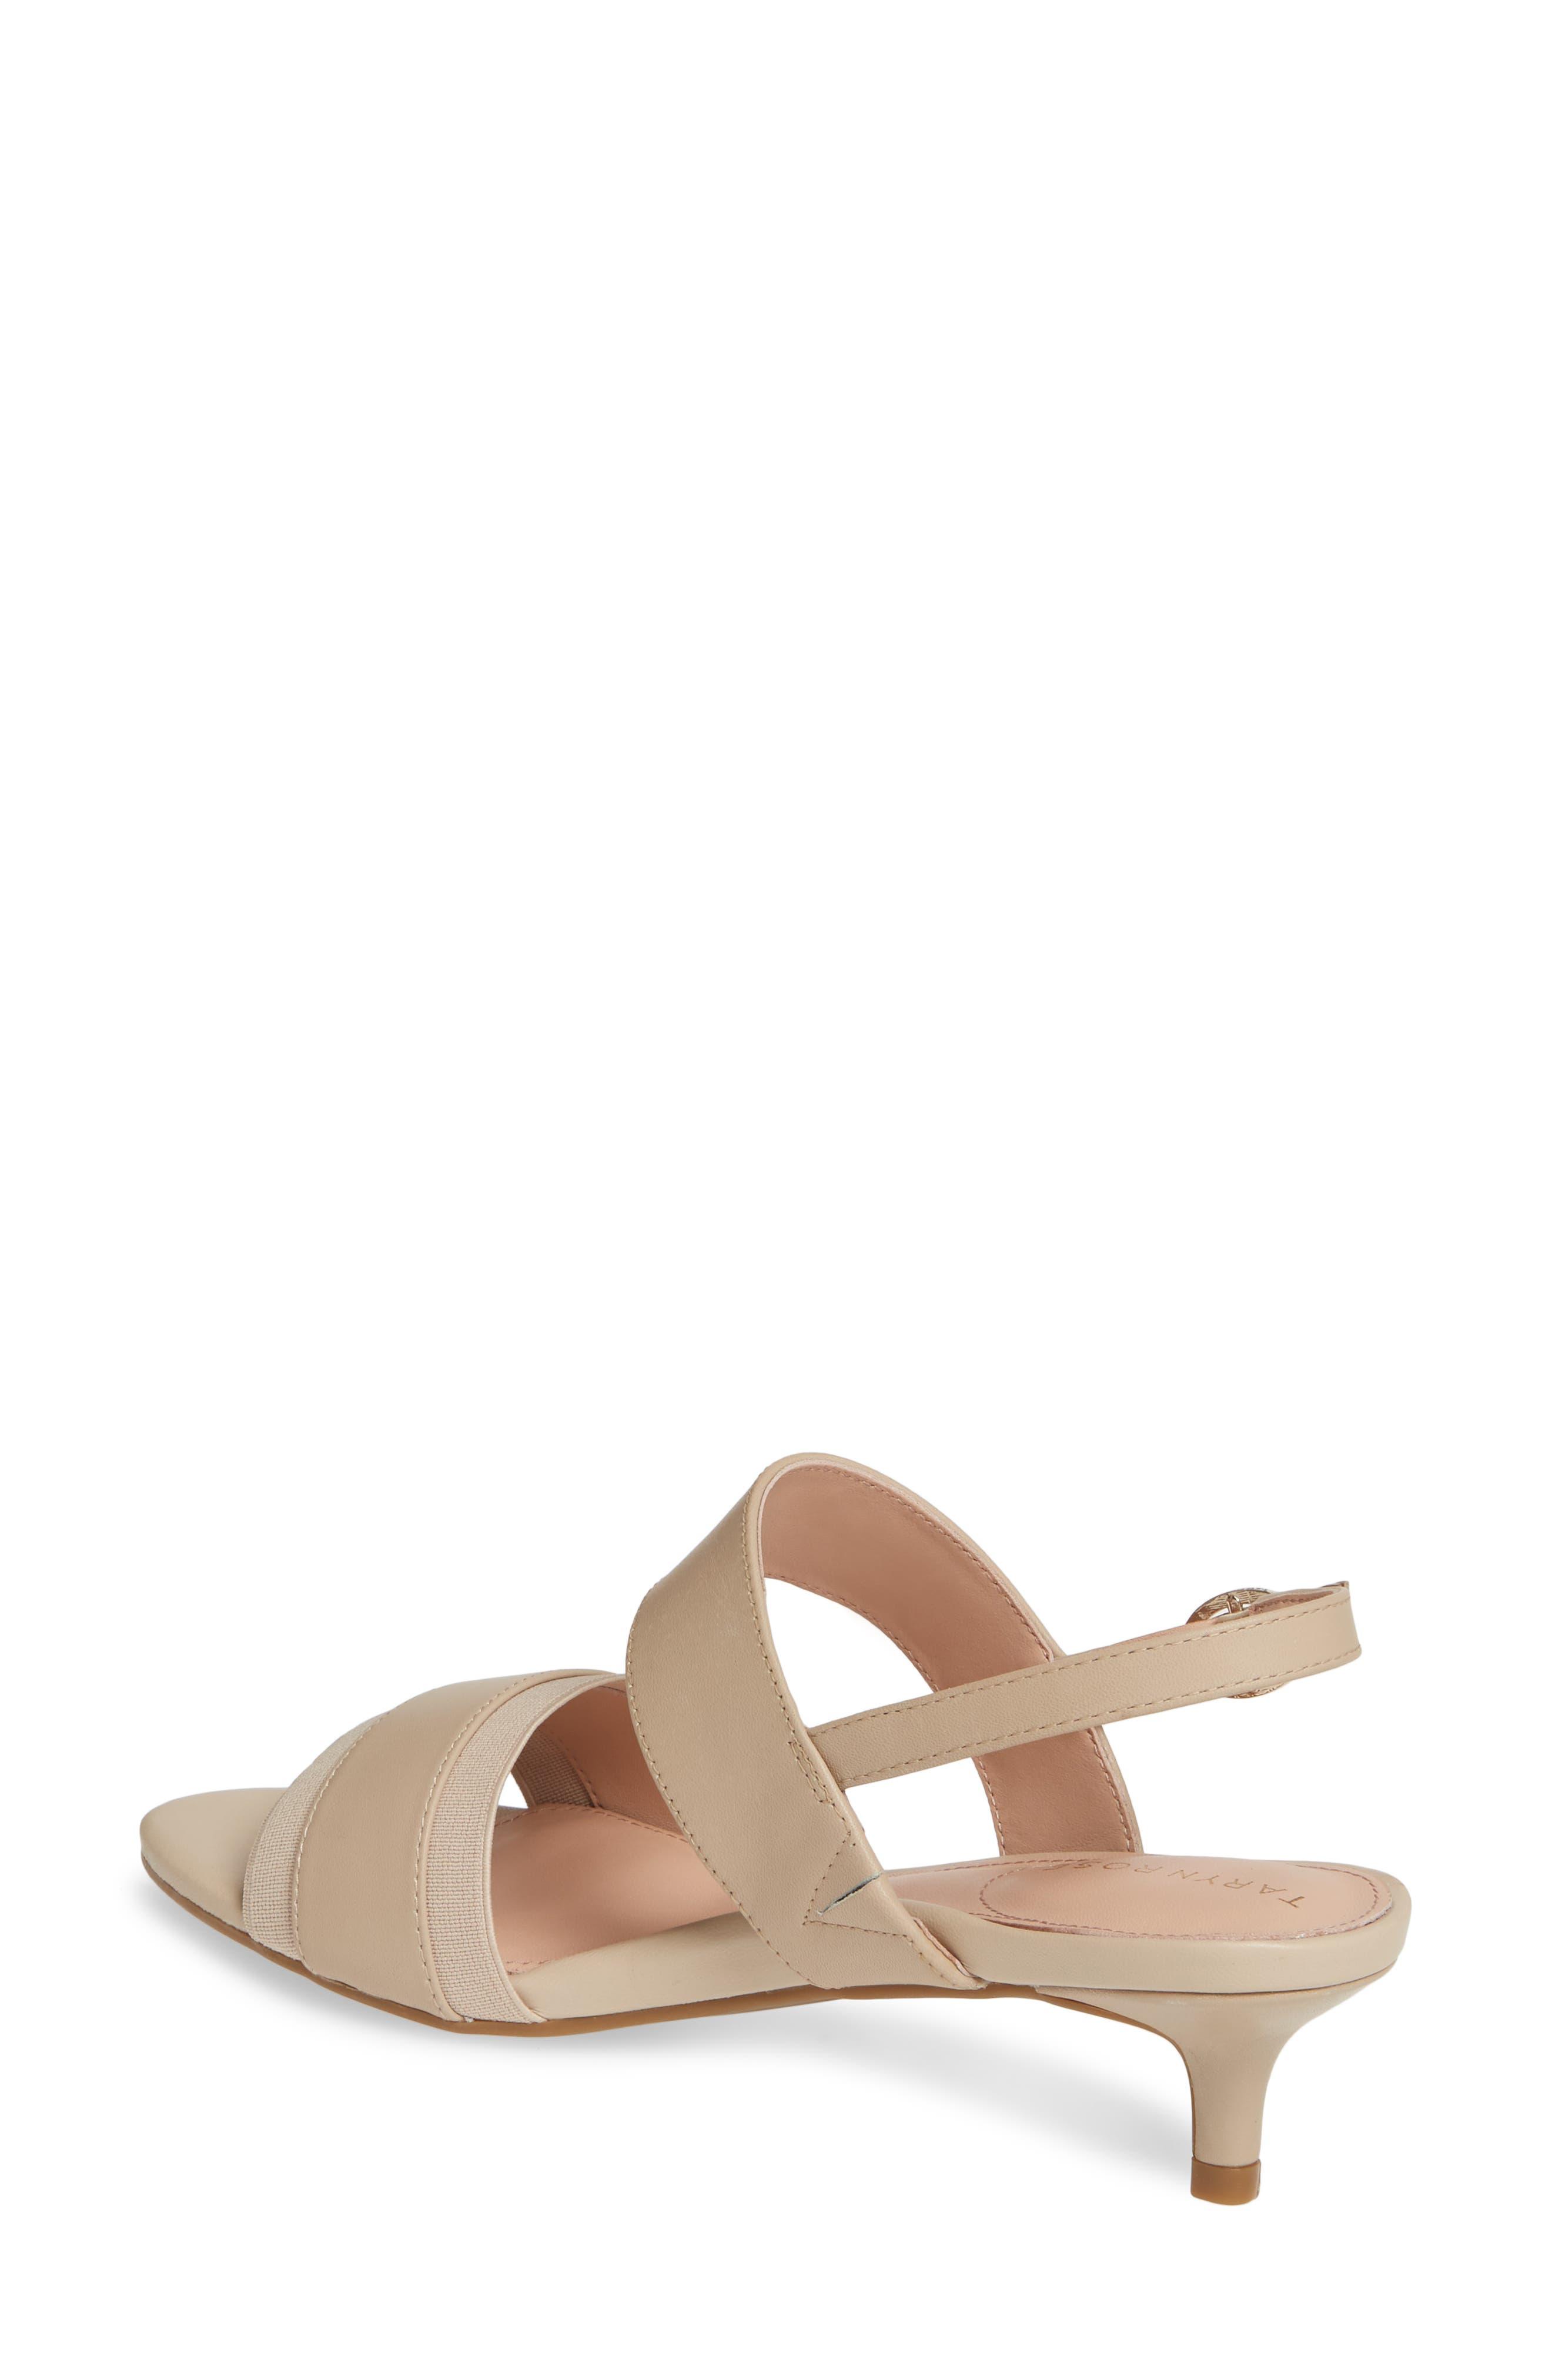 489c20fb8c13 Taryn Rose Affordable Sport Sandals for Women